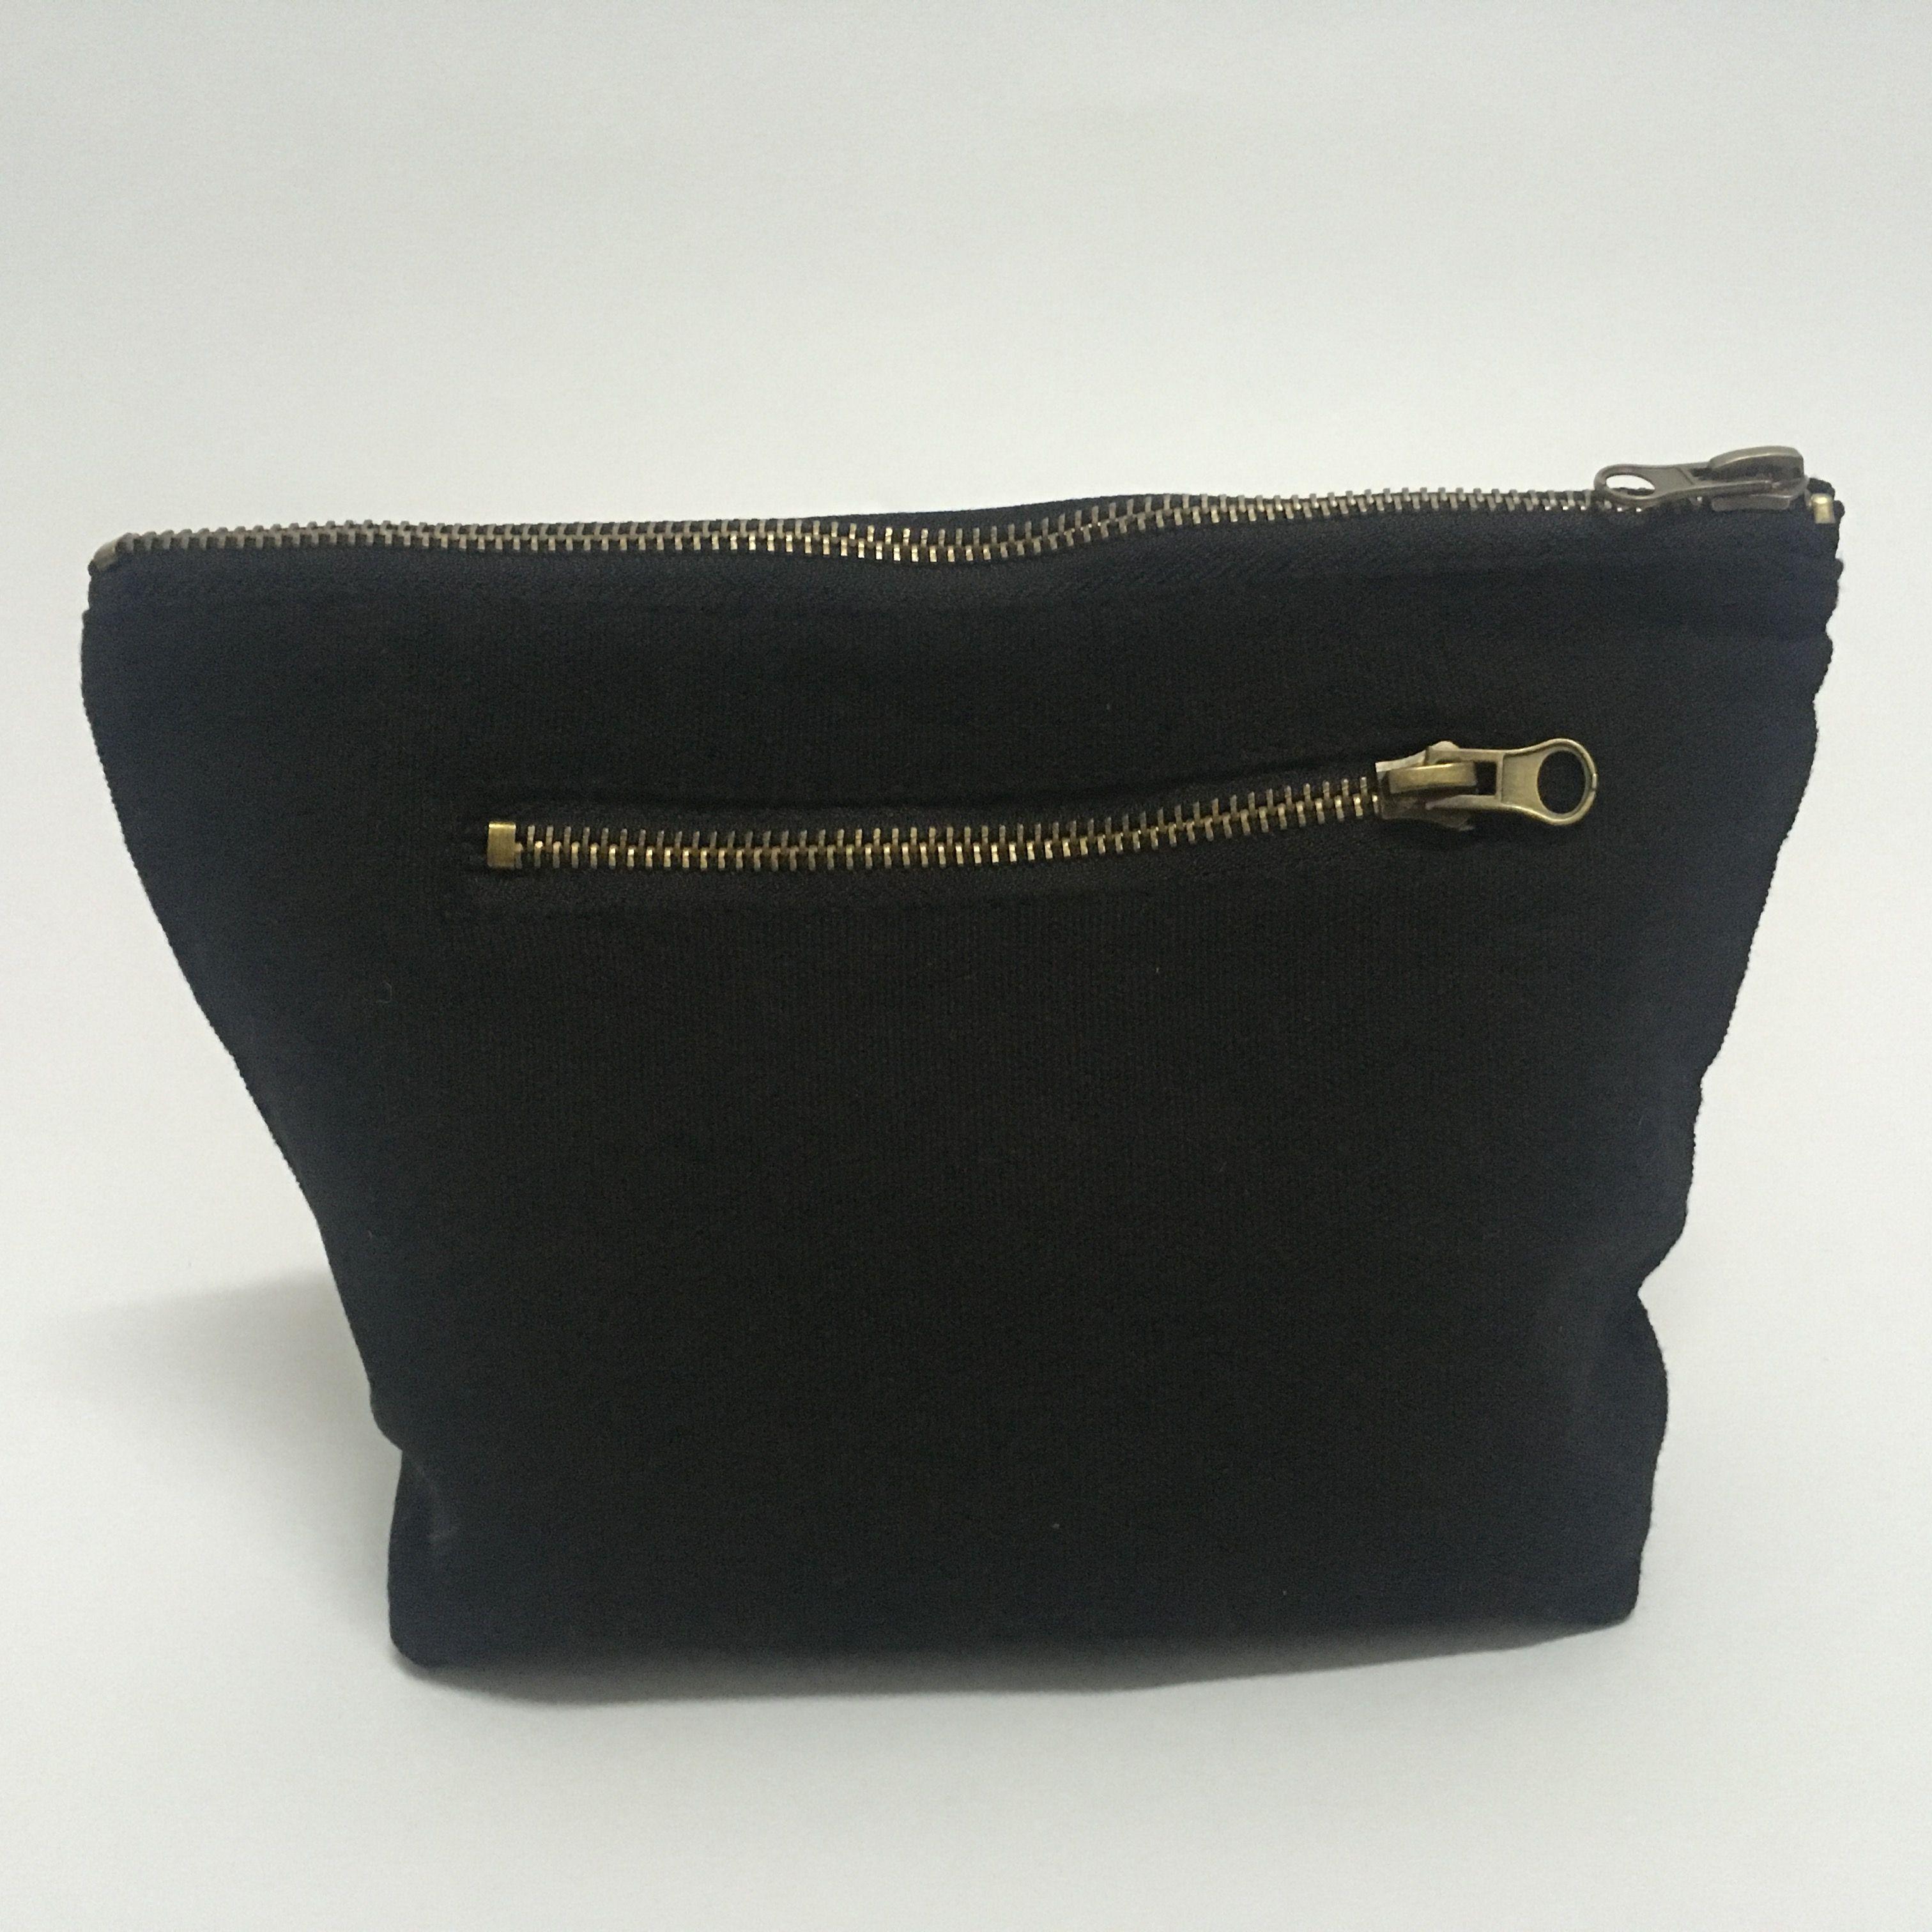 Personalized black wholesale canvas cosmetic bag, 12oz